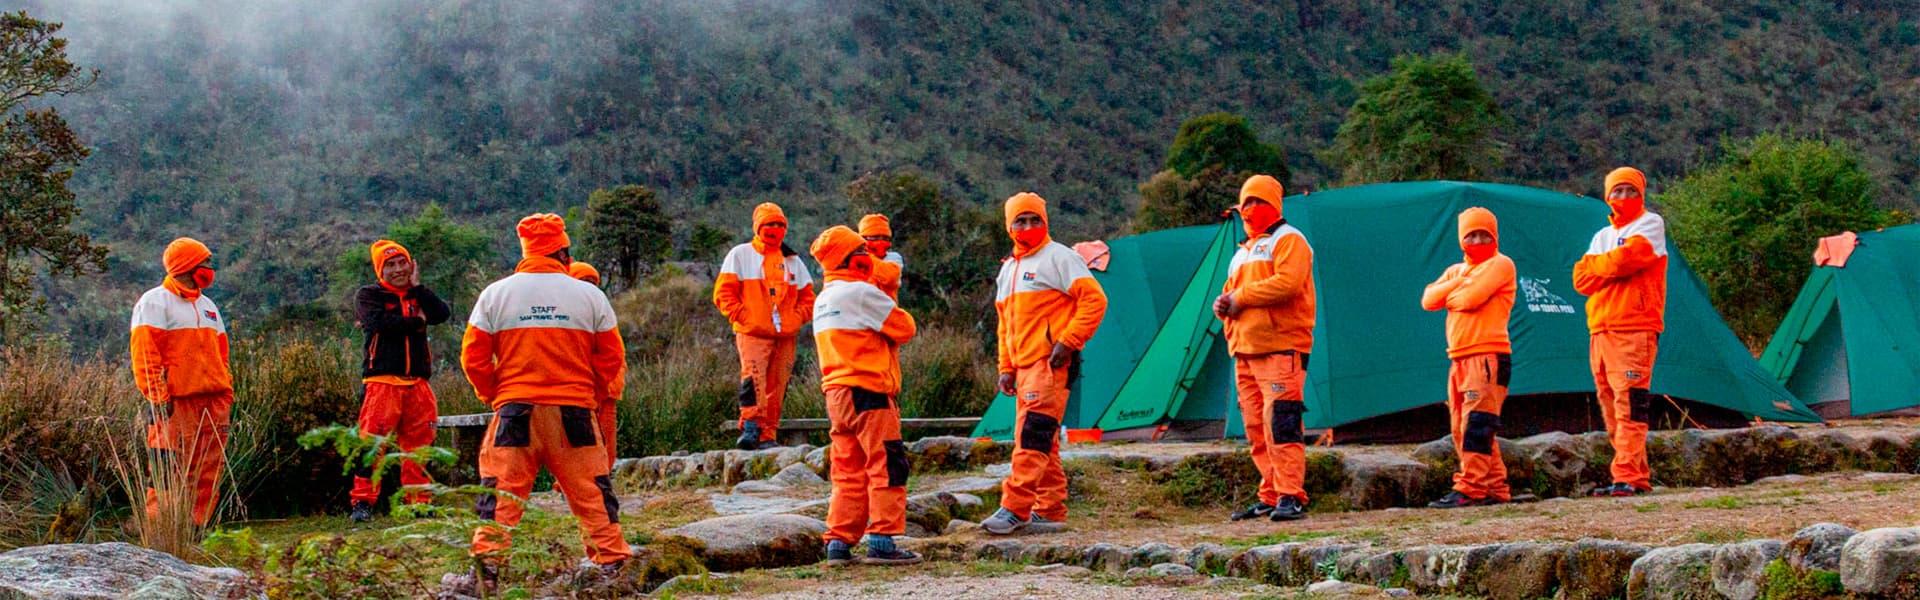 Inca trail To Machu Picchu porters